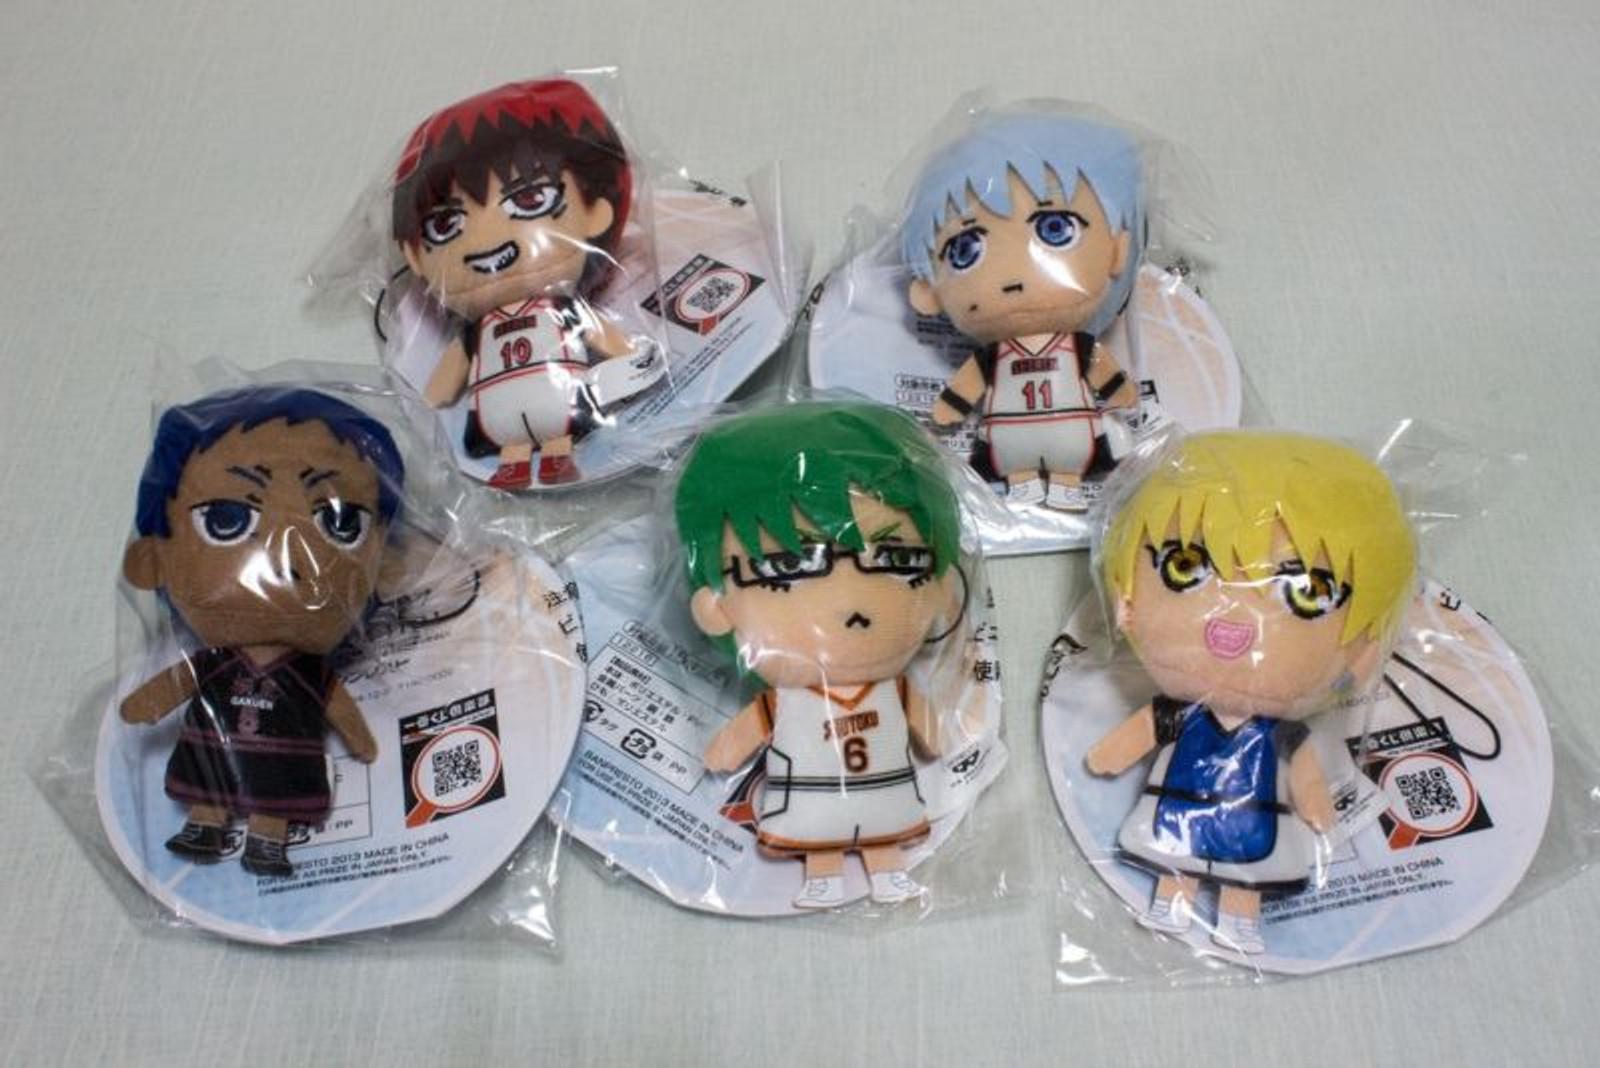 Set of 5 Kuroko no Basuke Figure Plush Doll Strap Ichiban Kuji Banpresto JAPAN